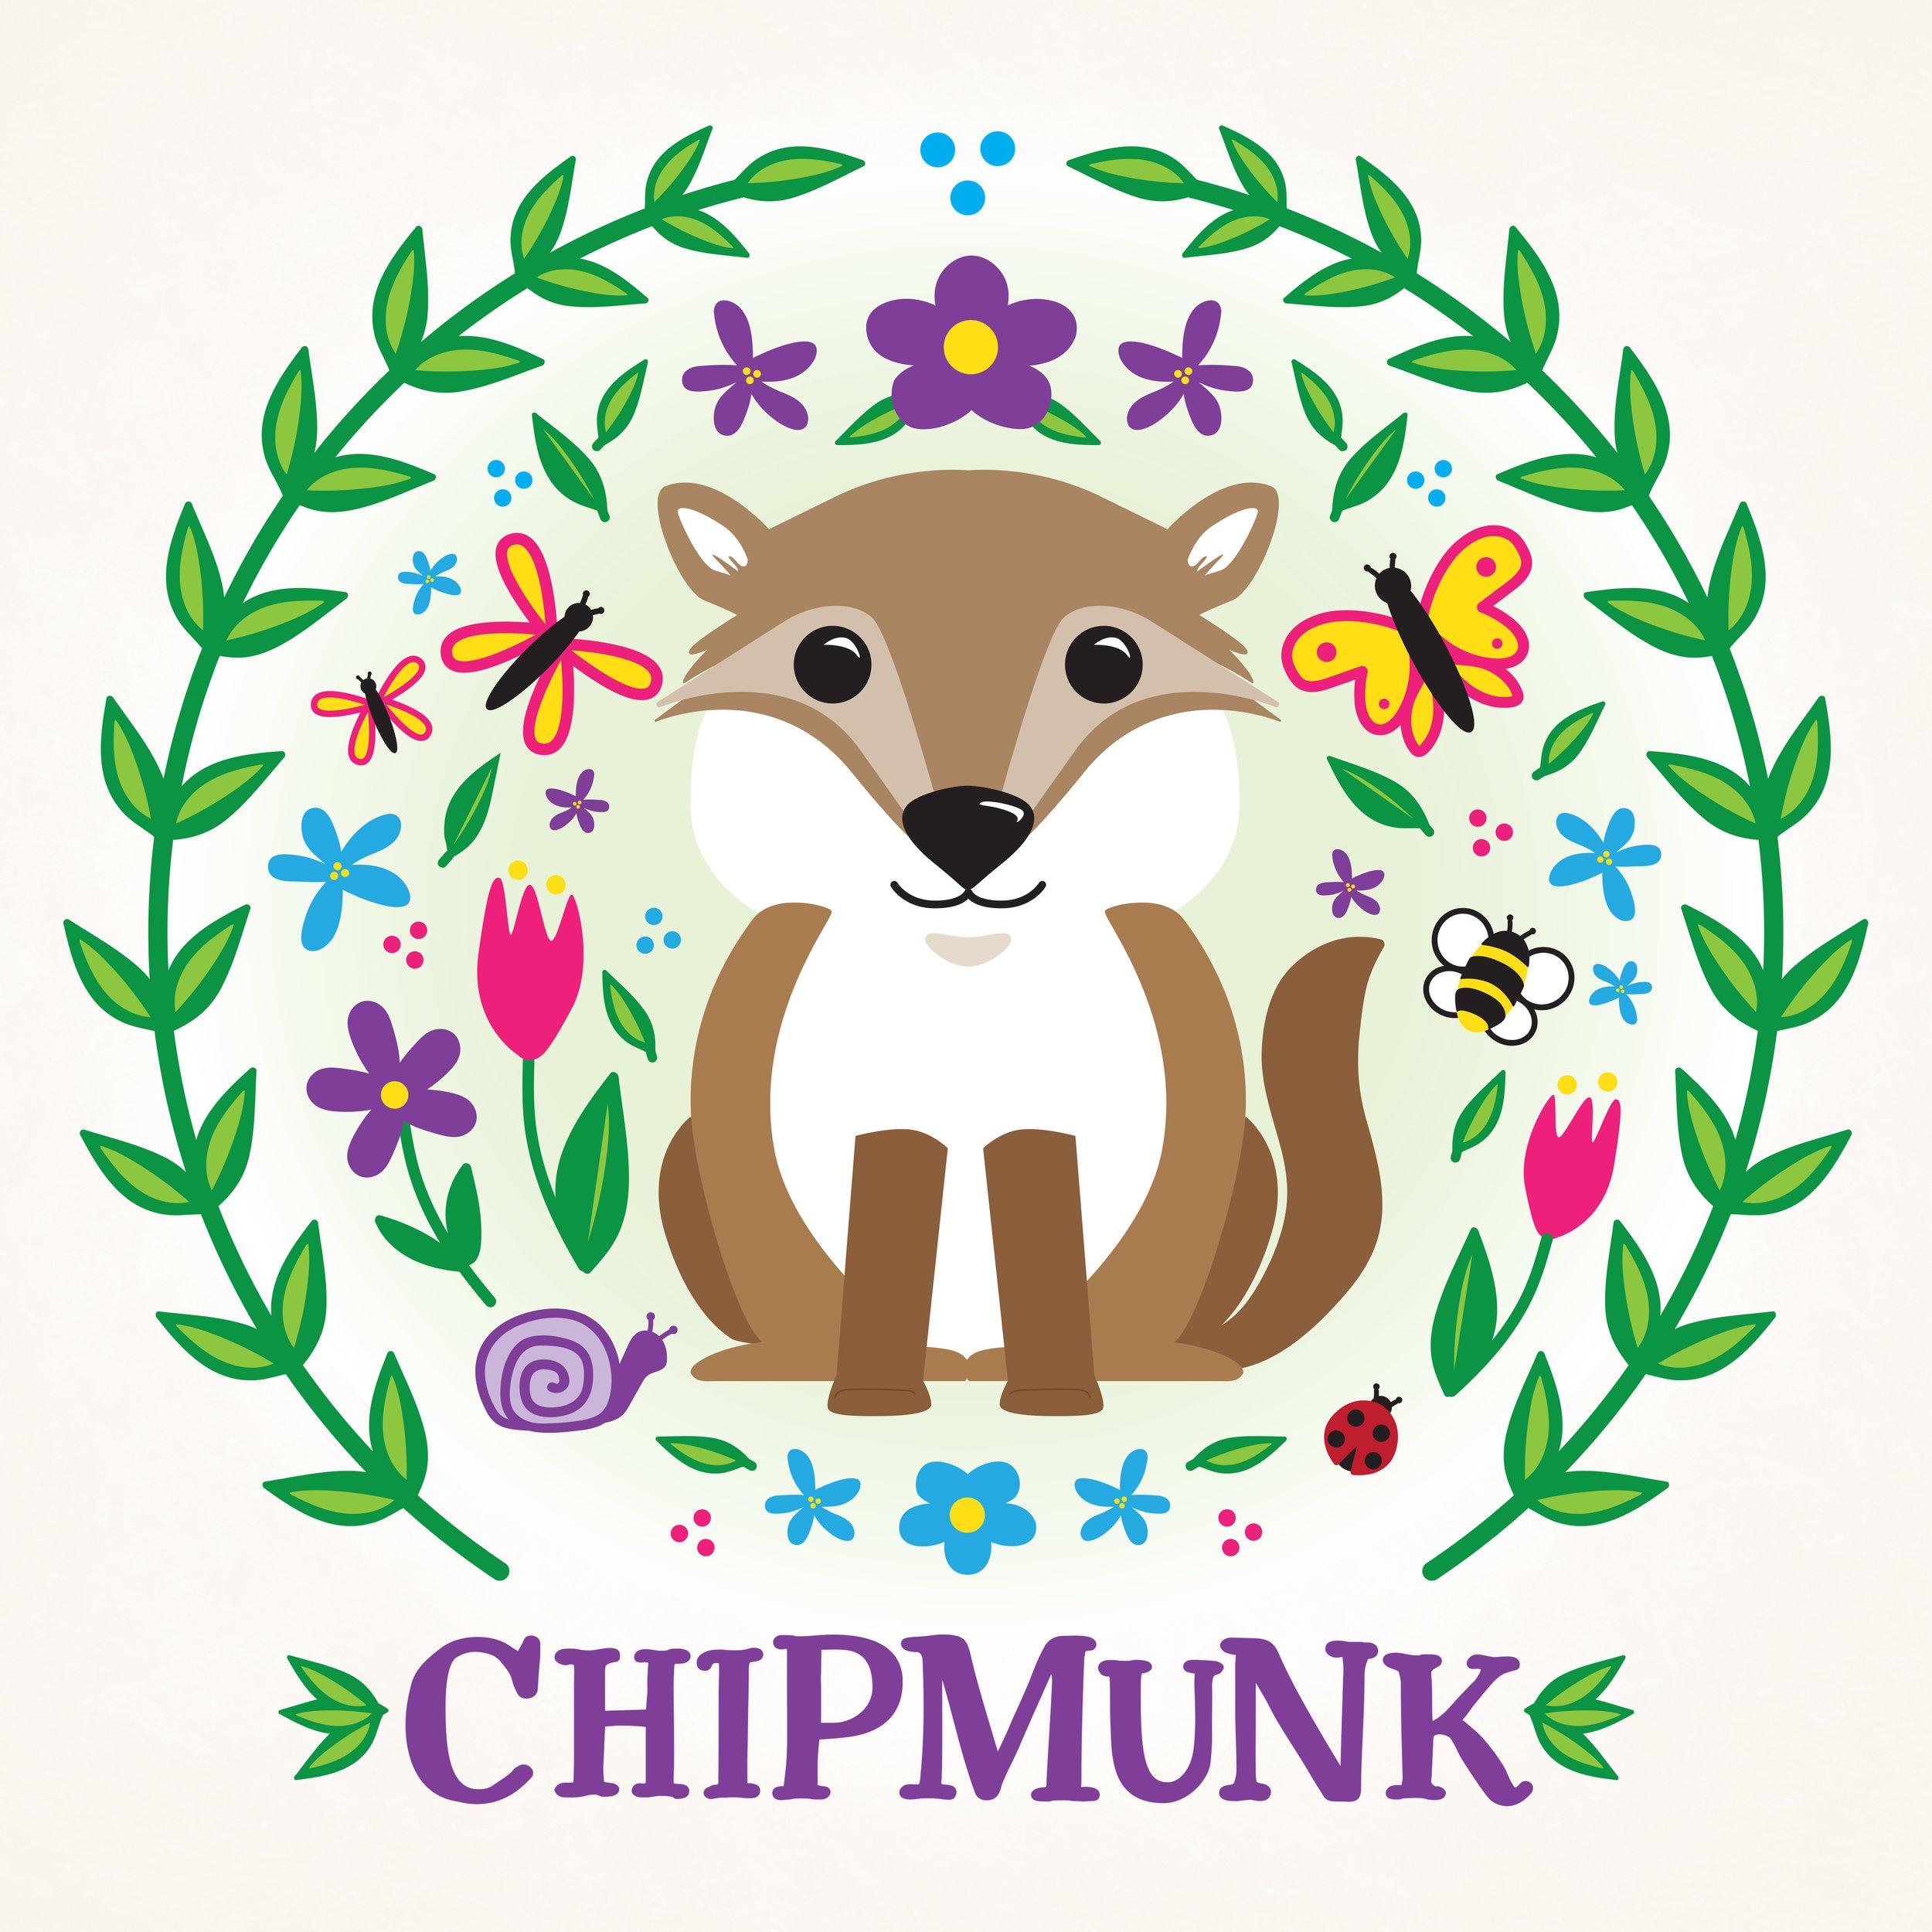 chipmunk.jpg